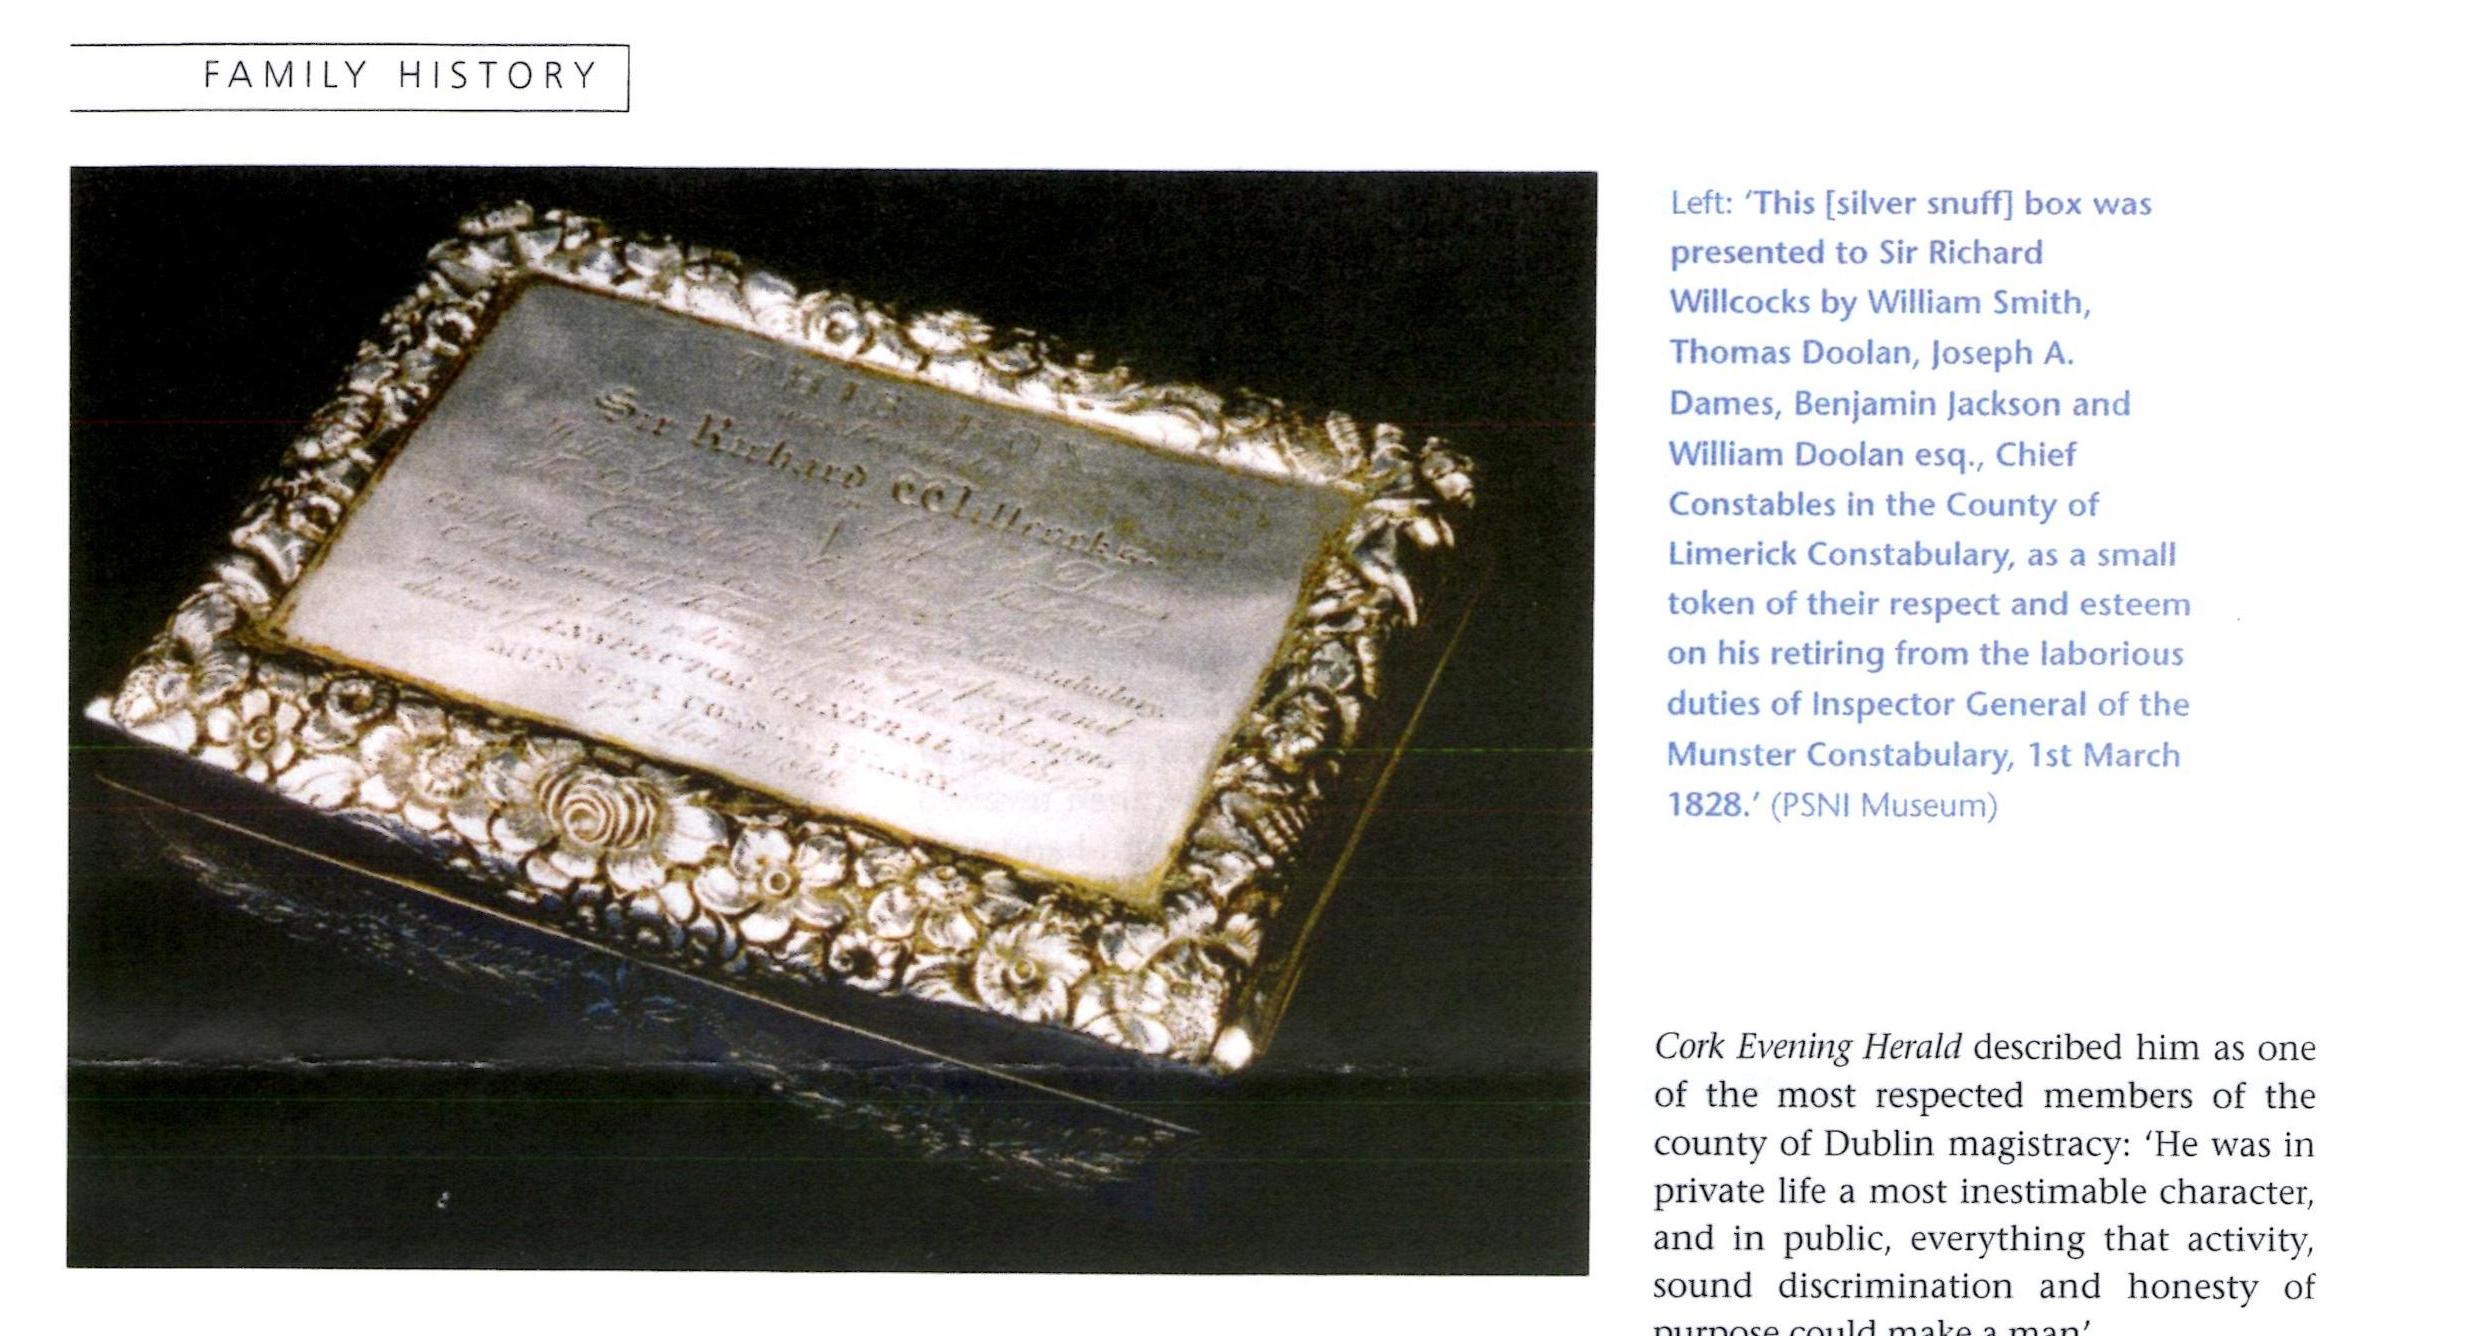 thesis binding washington street cork Copy print cork - 12a washington street west, cork tel: 021-4278078 fax: 021- 4278079.